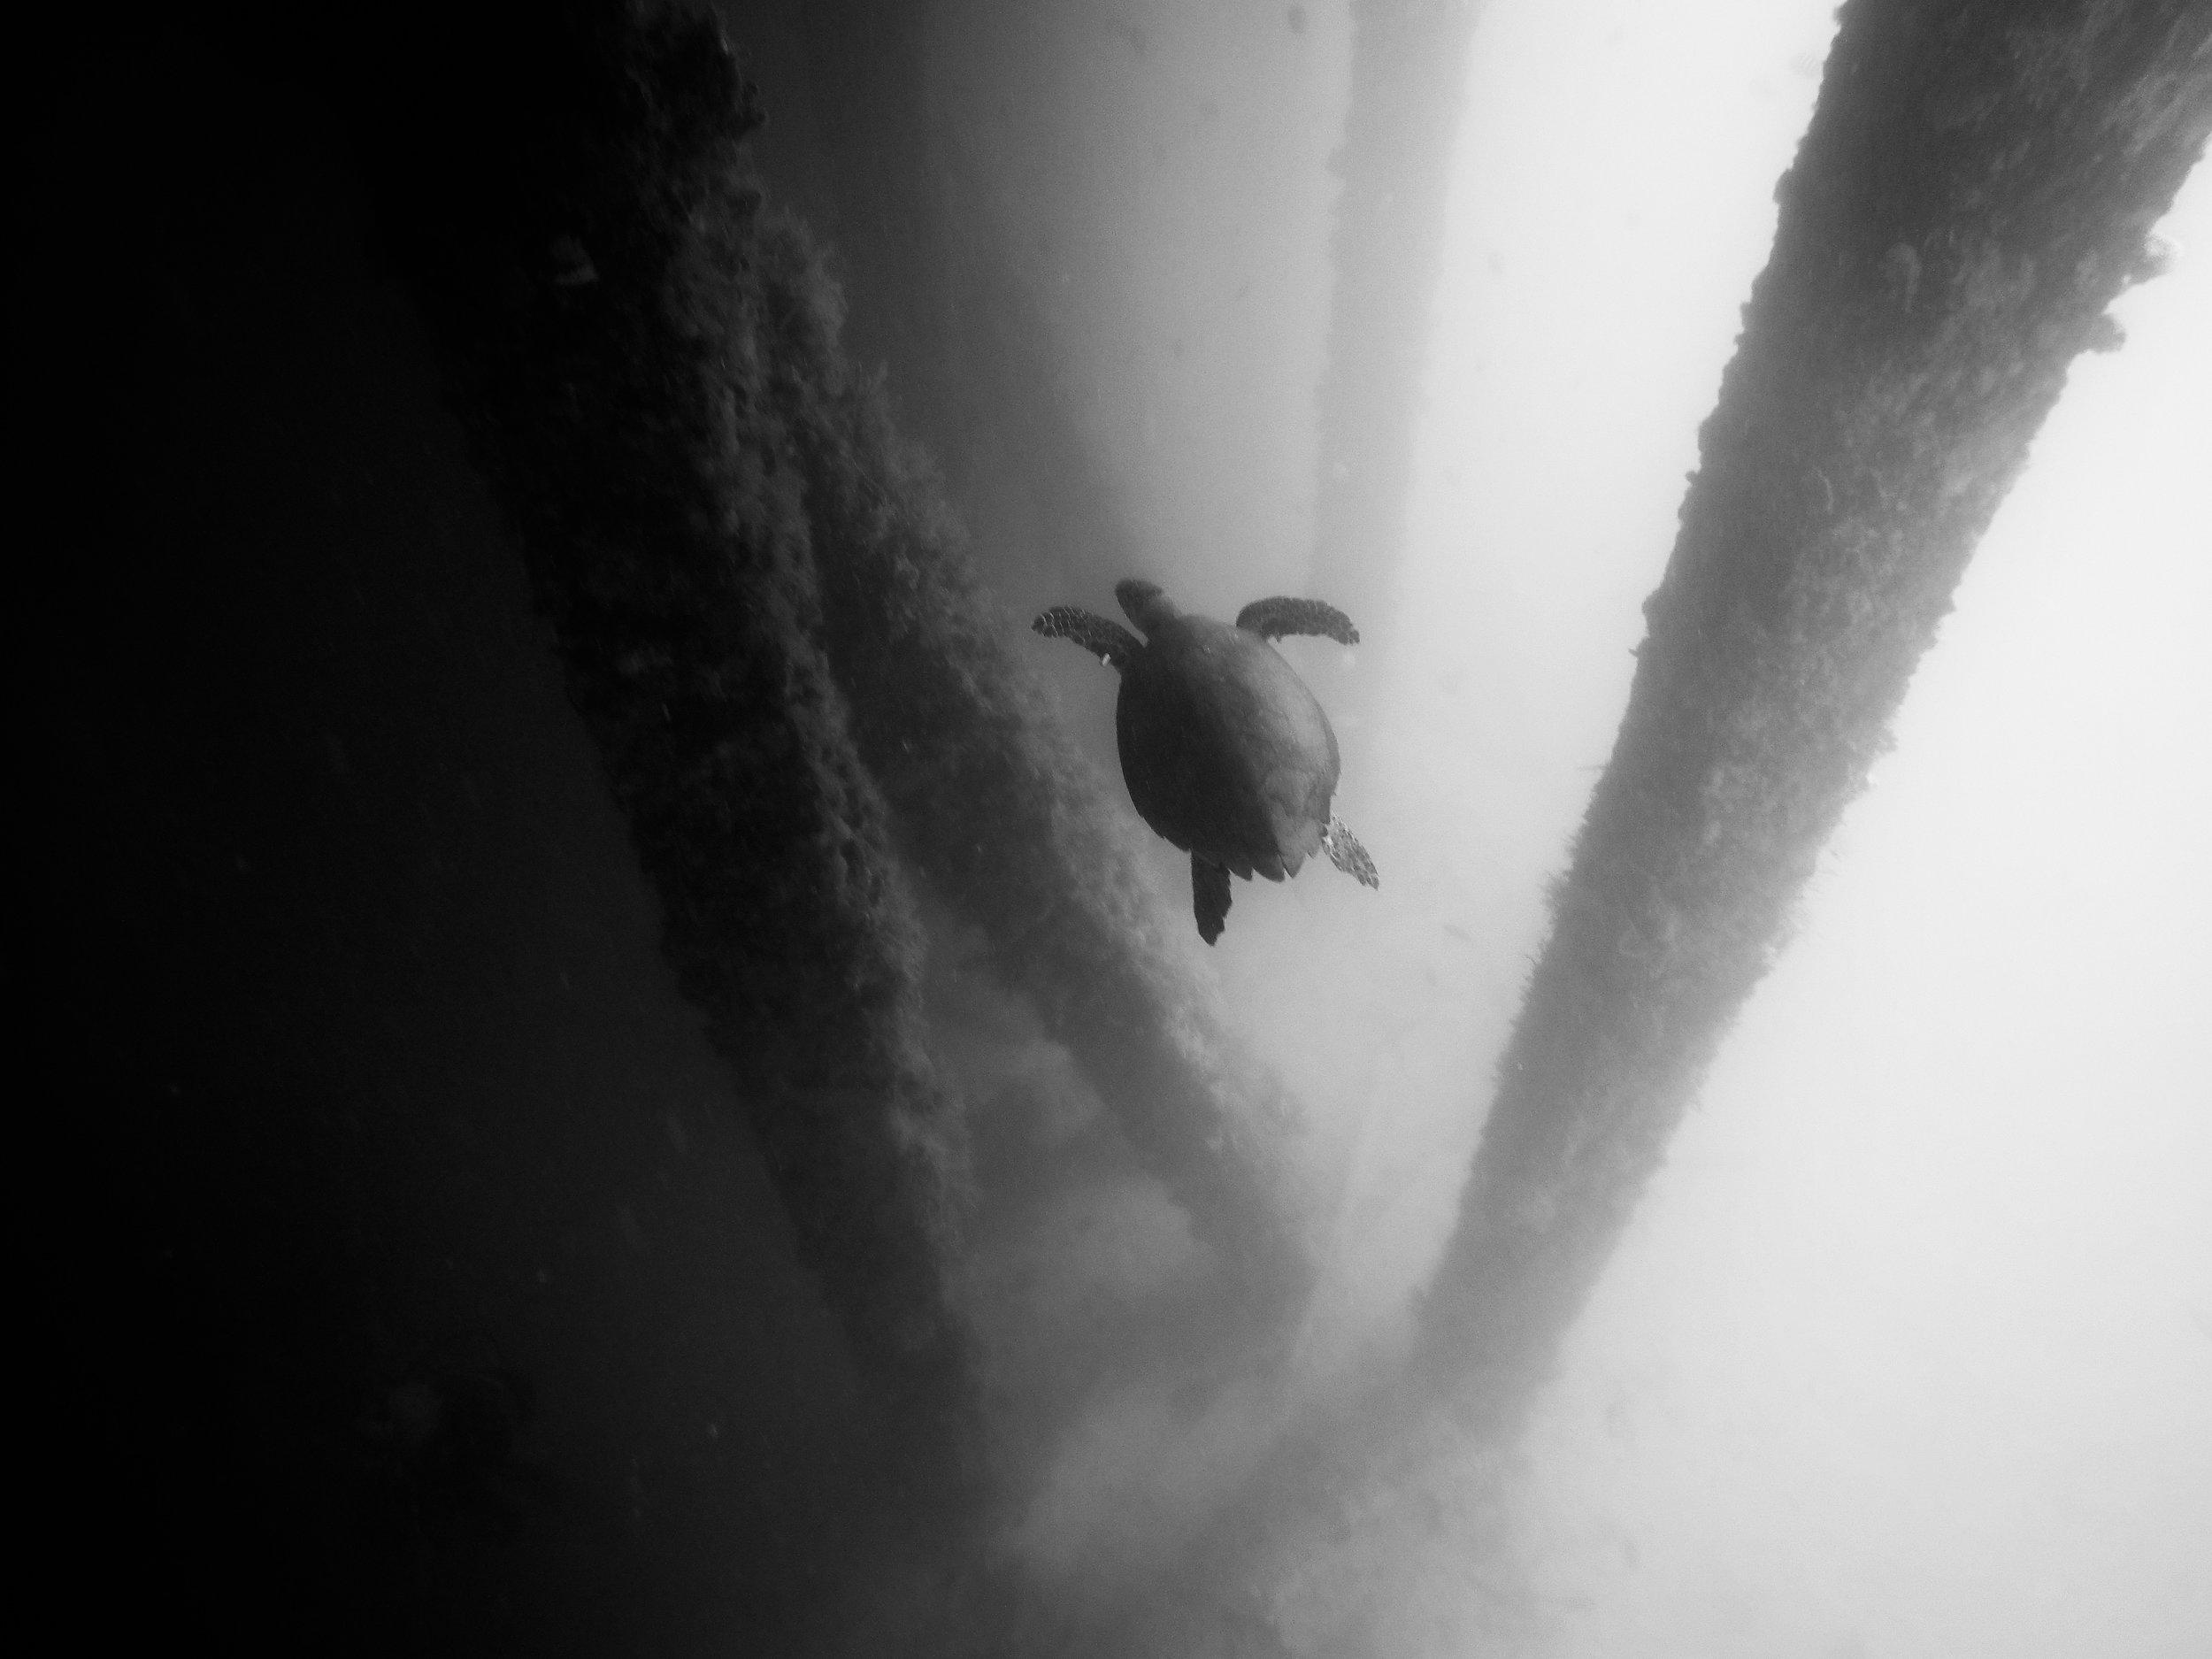 Puerto Rico Sea Turtle - Devin Feil